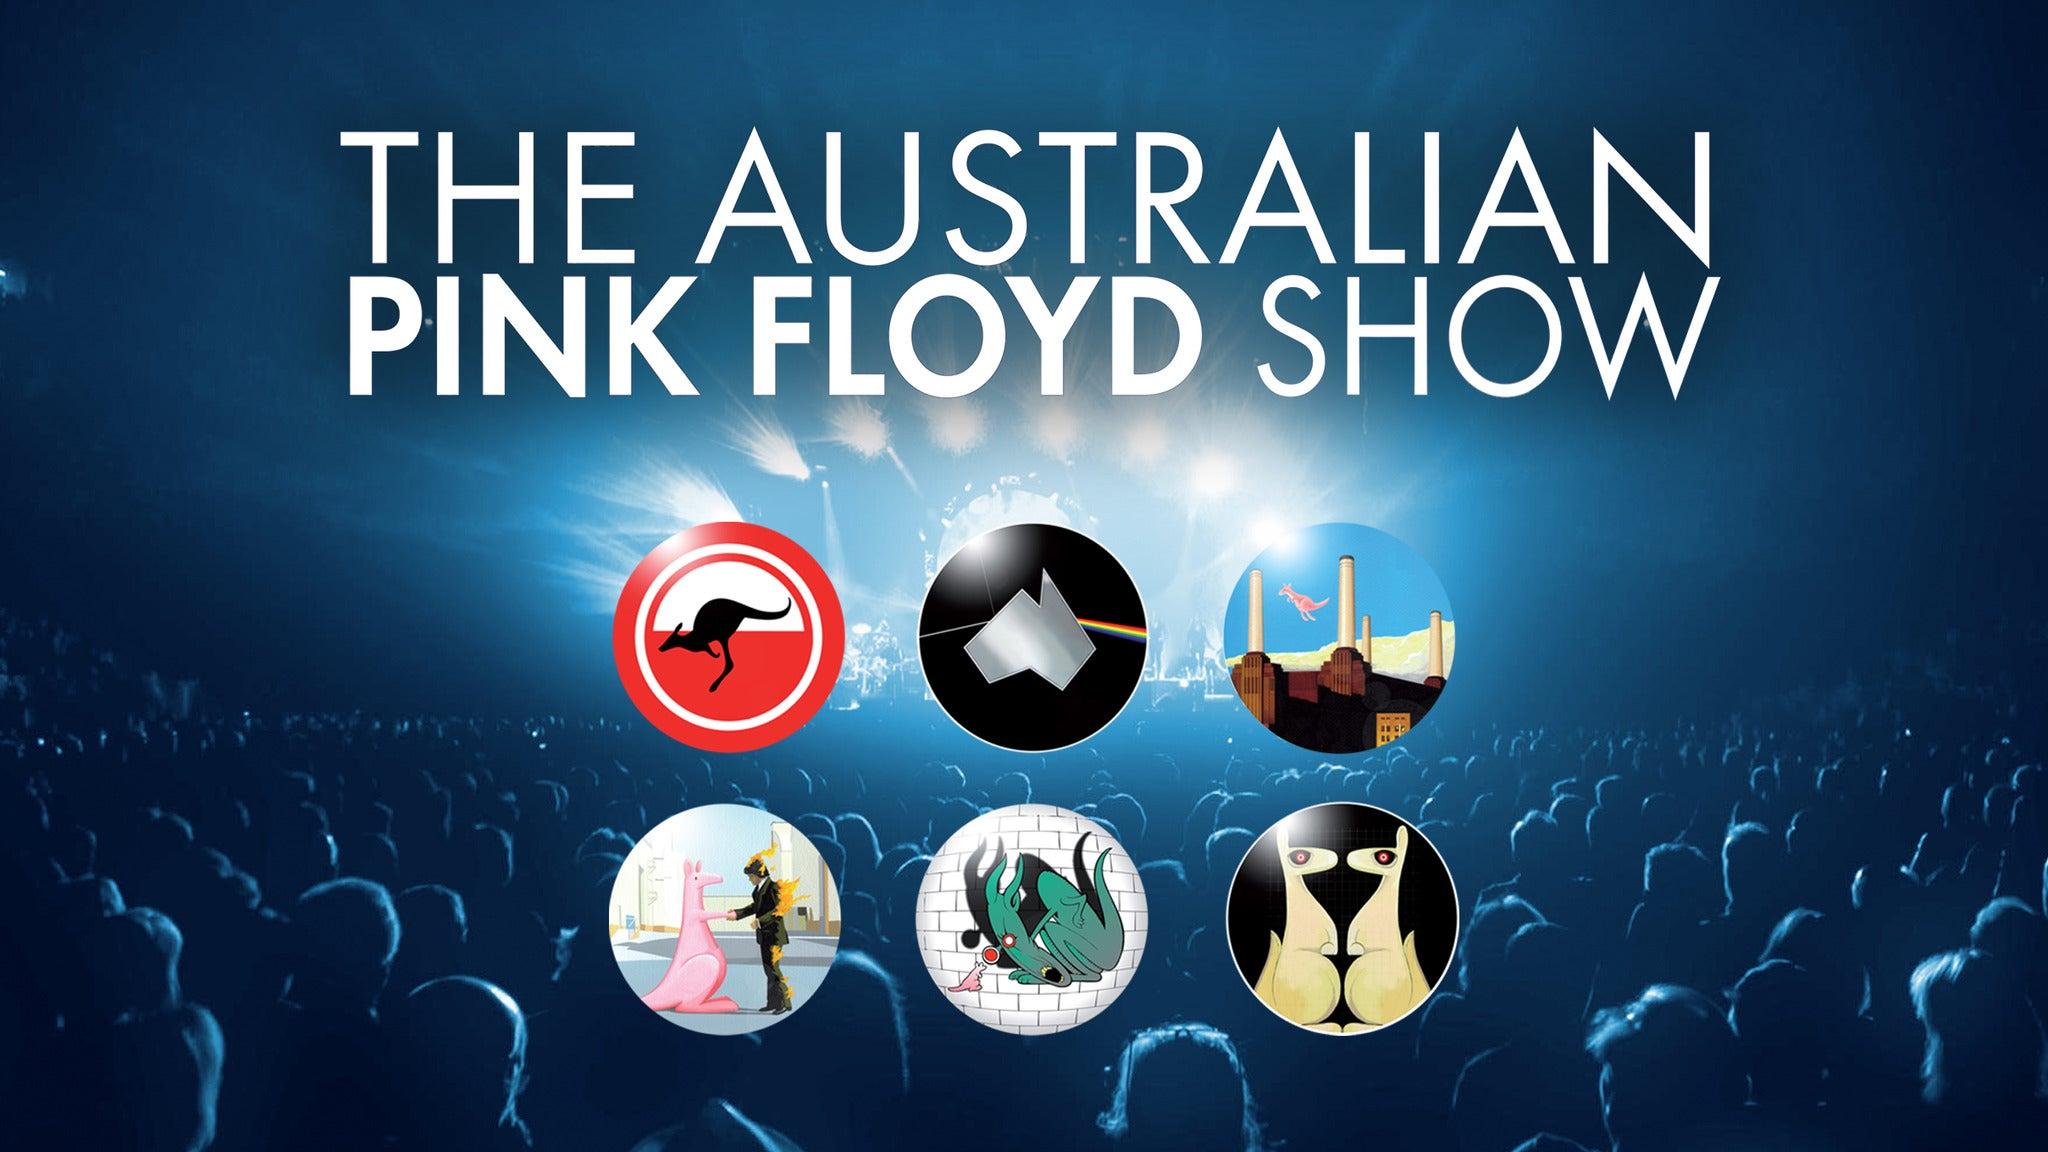 The Australian Pink Floyd Show at Tuscaloosa Amphitheater